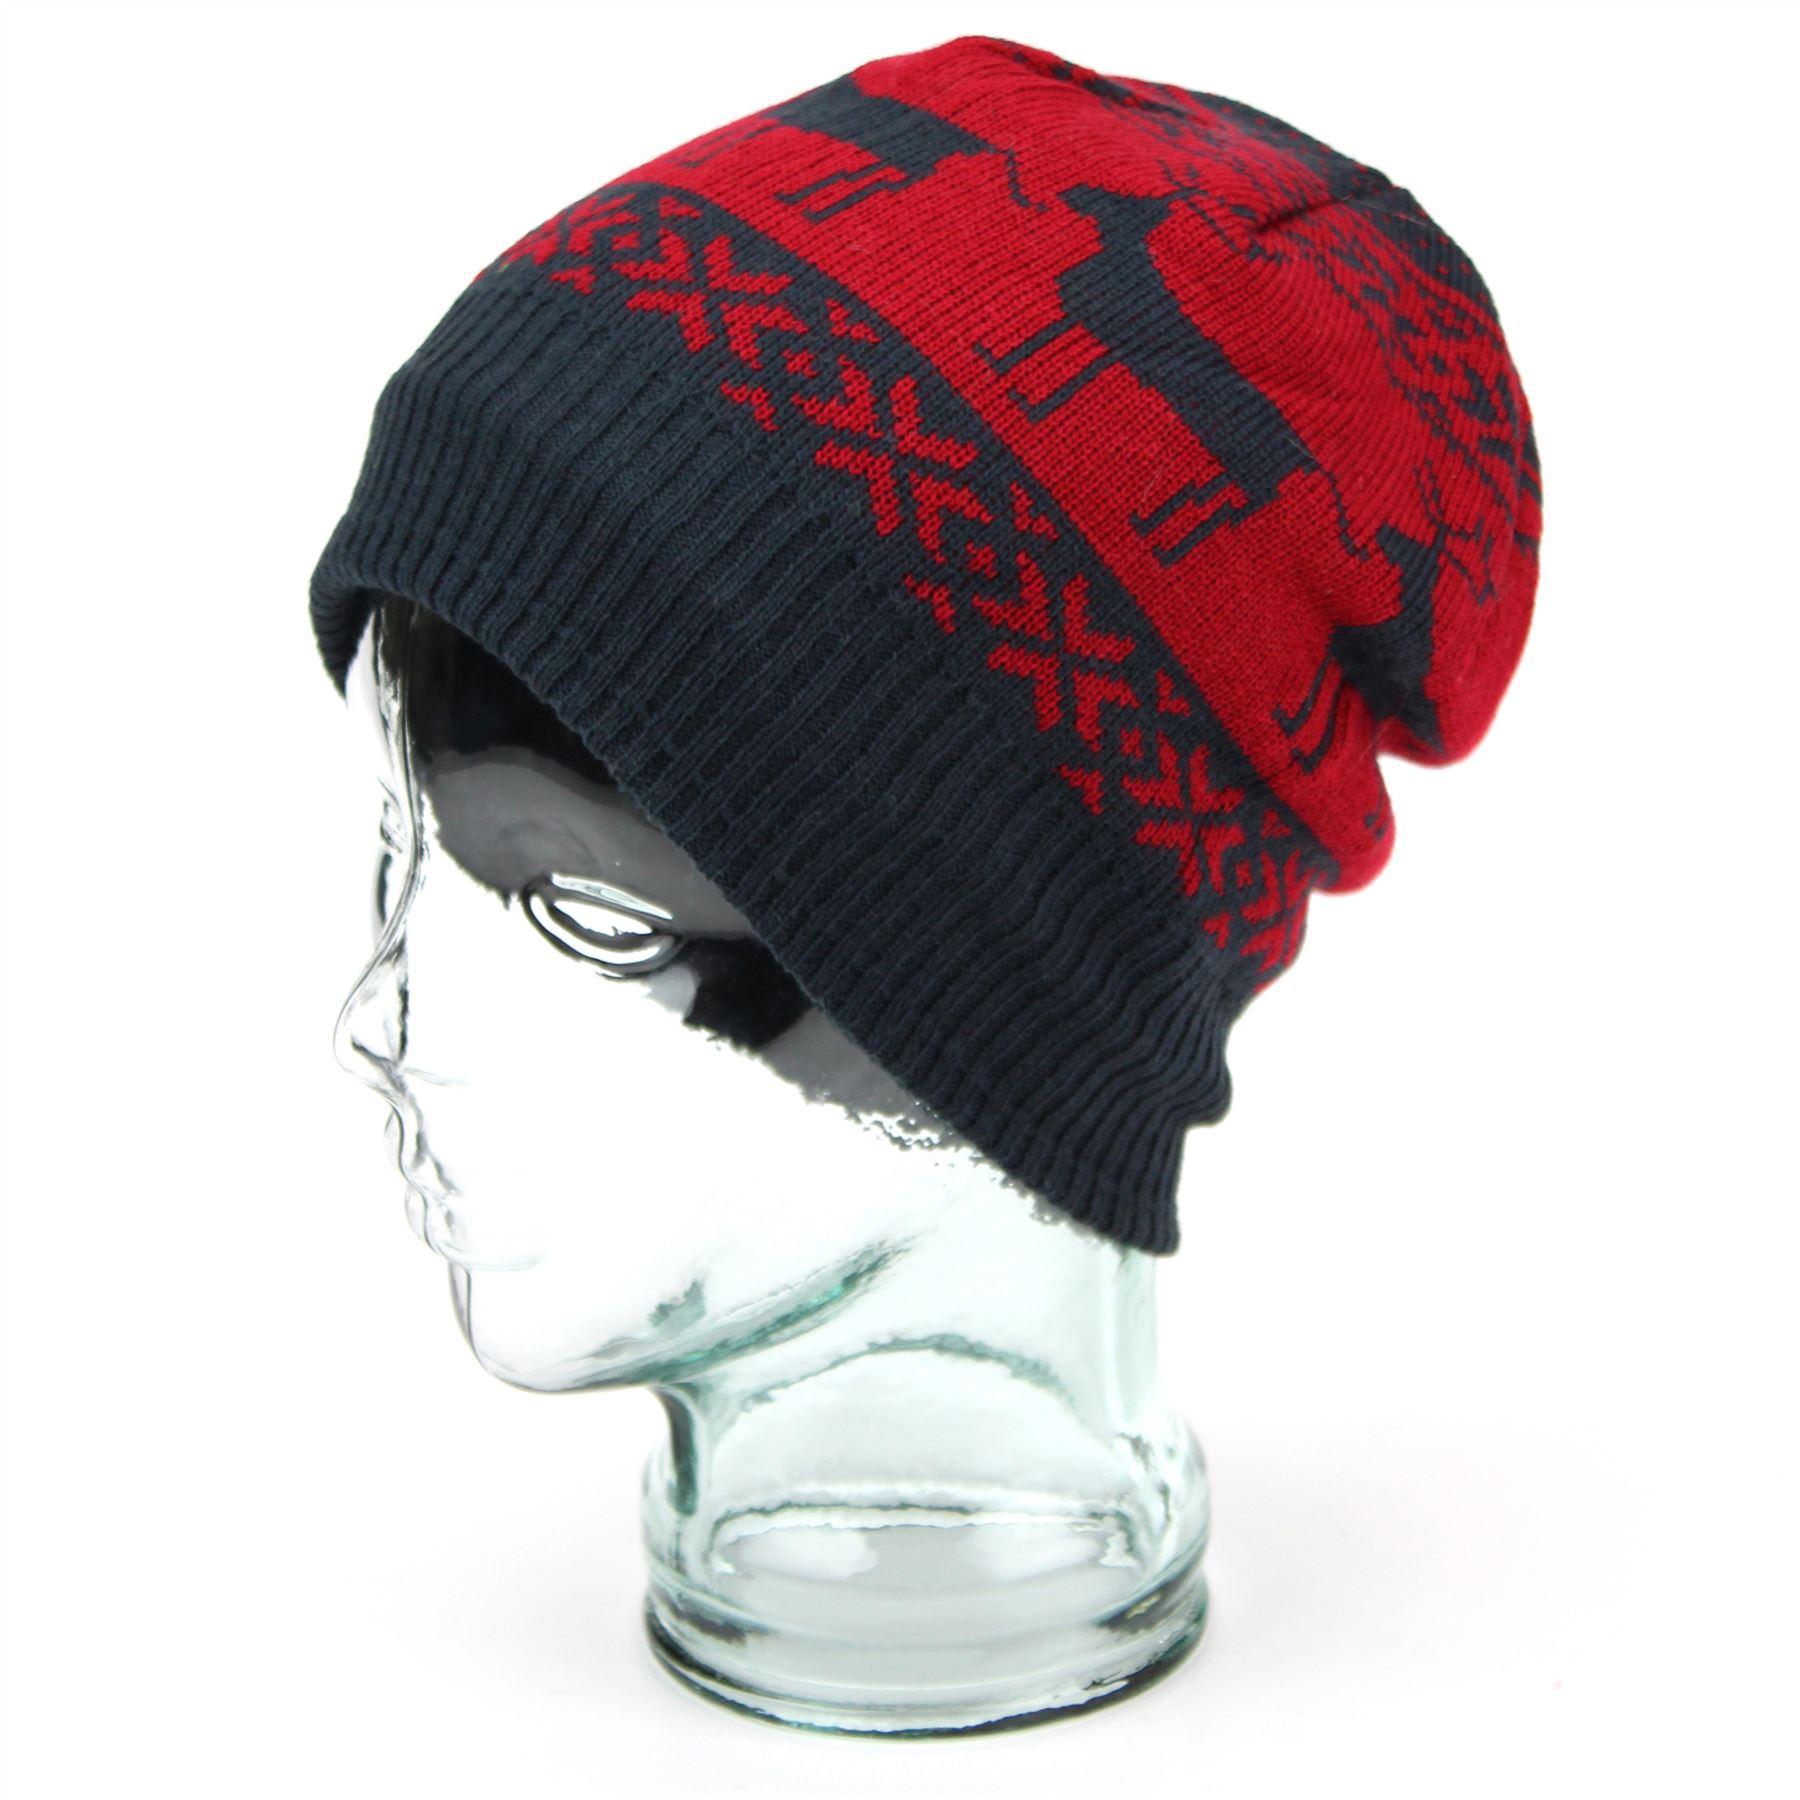 Hat beanie reindeer winter ski christmas knitted xmas